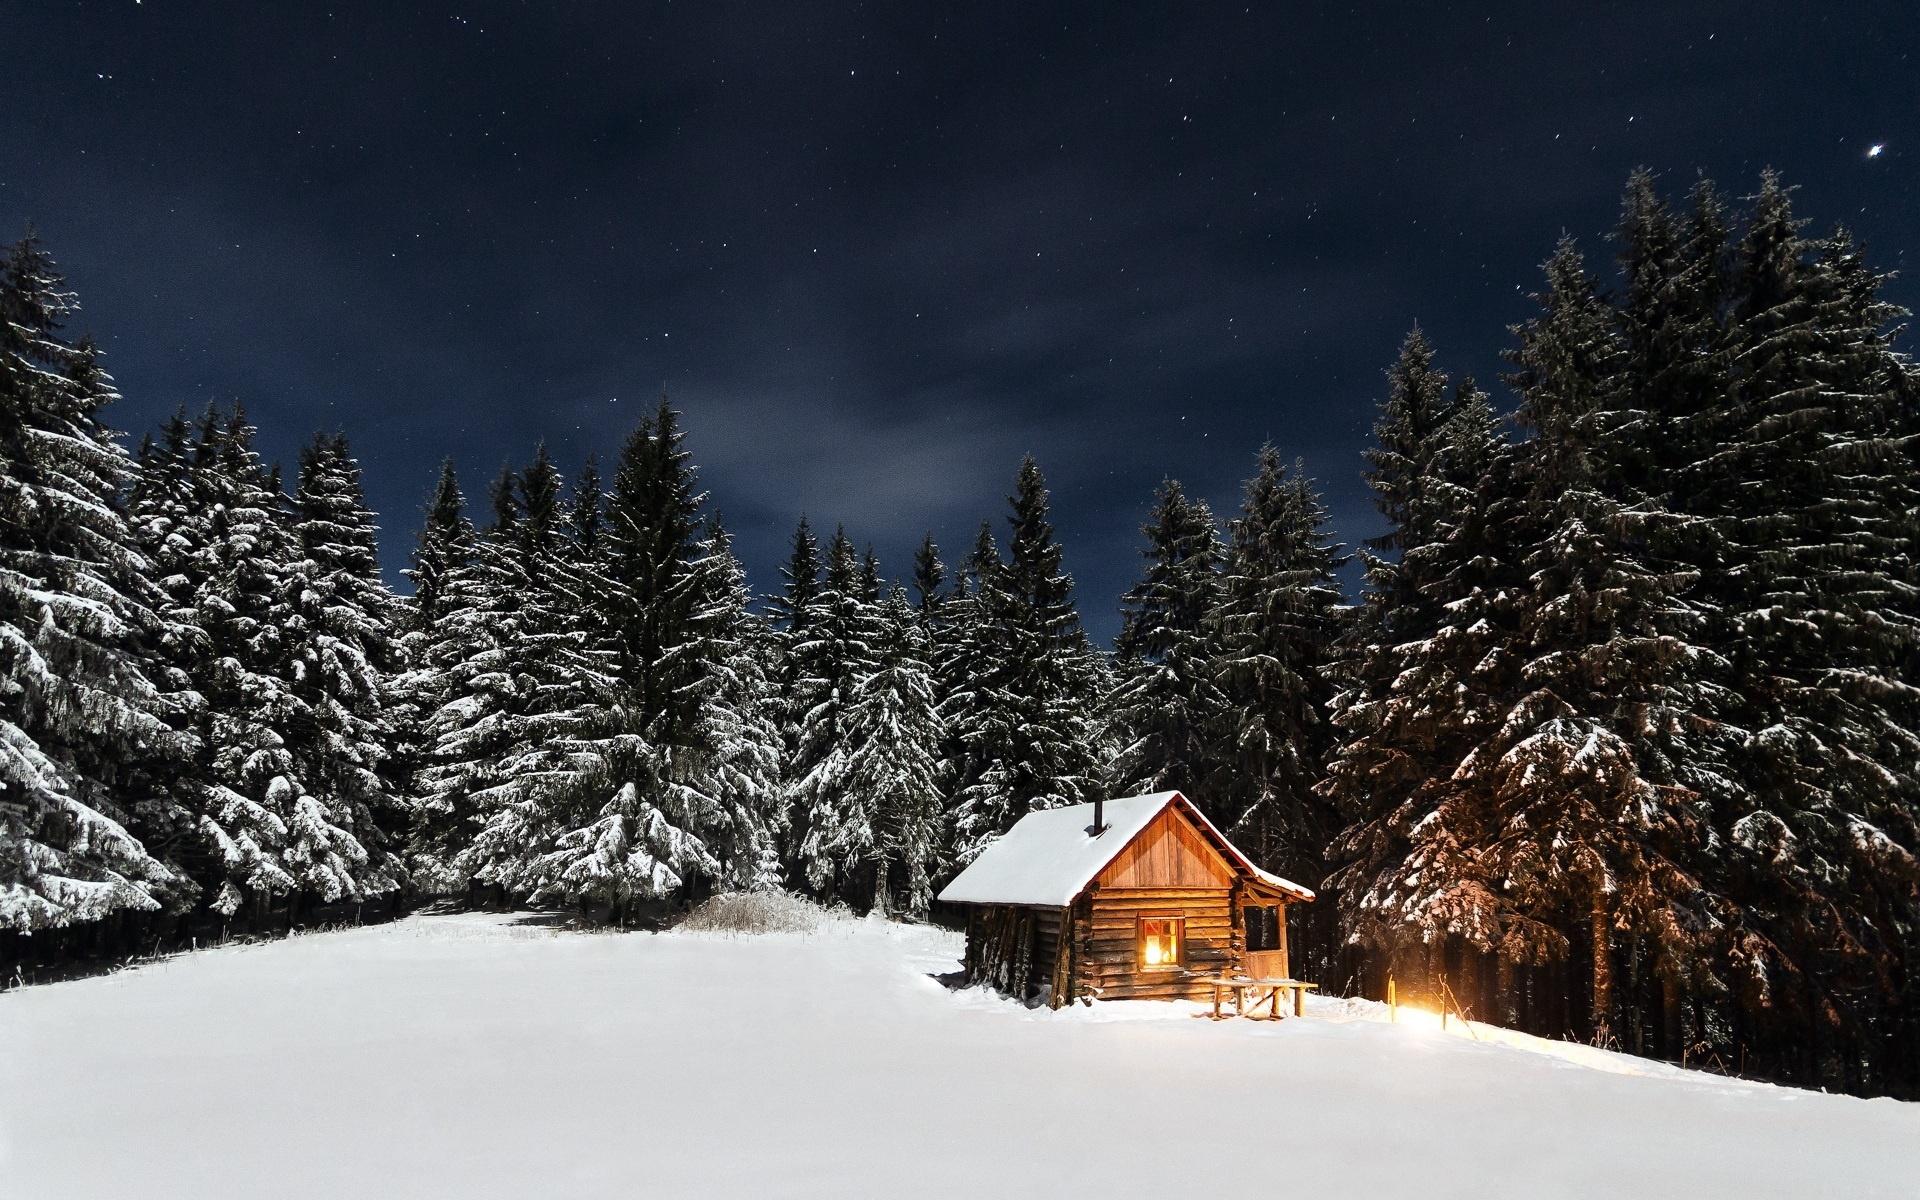 One Snowy Night M Christina Butler Tina Macnaughton